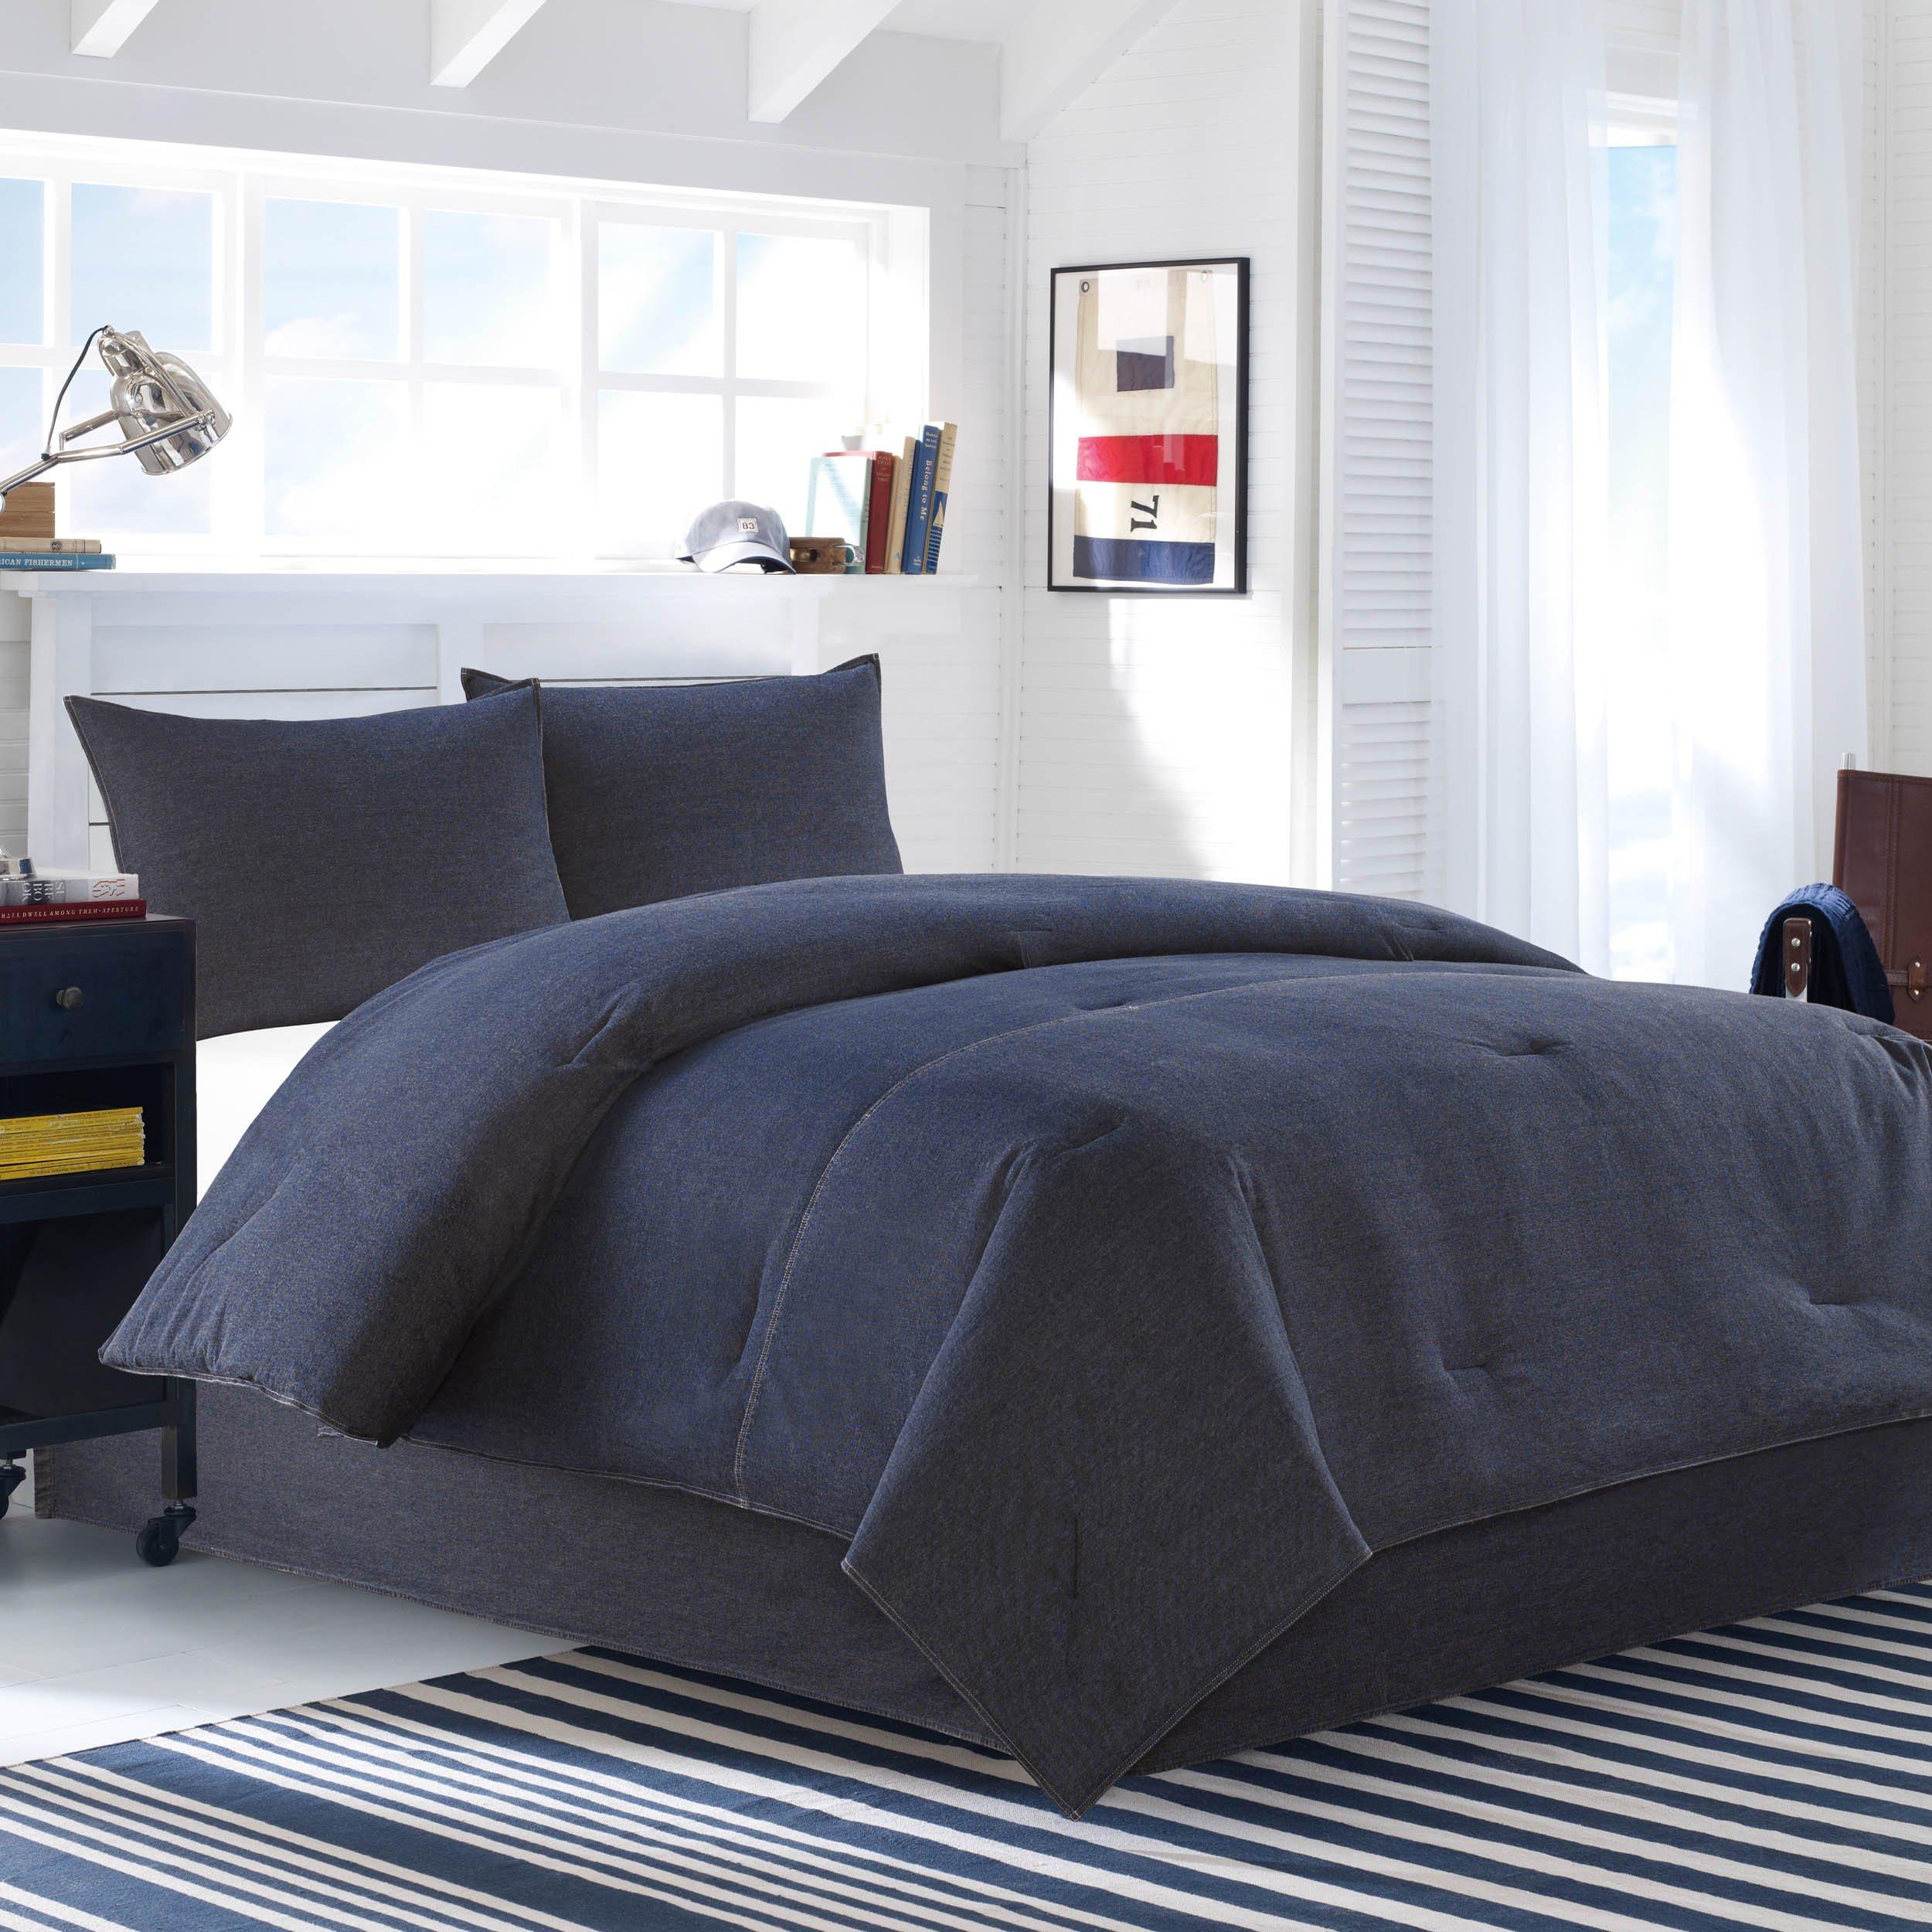 Nautica Seaward Denim Comforter Set, King